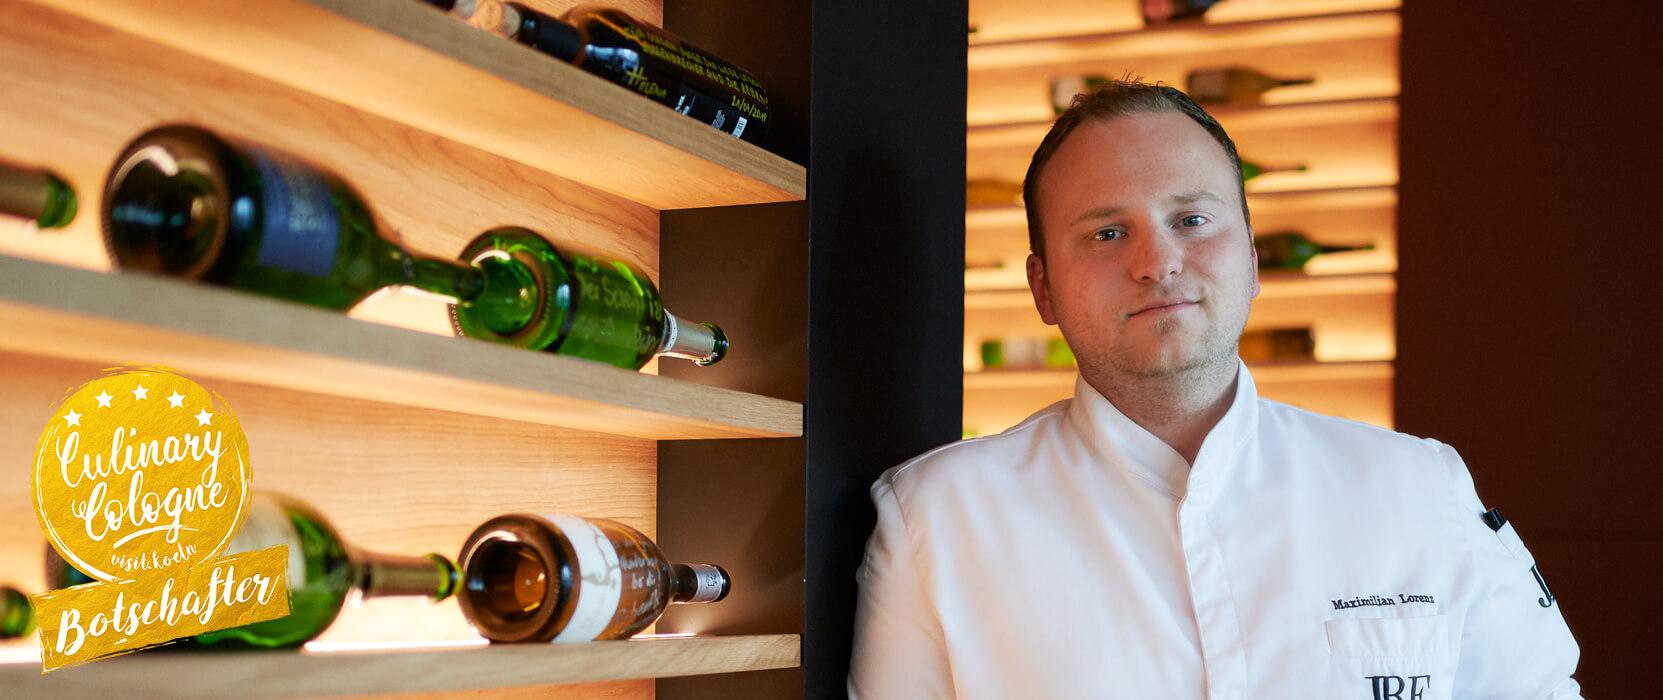 Maximilian Lorenz - #culinarycologne-Botschafter